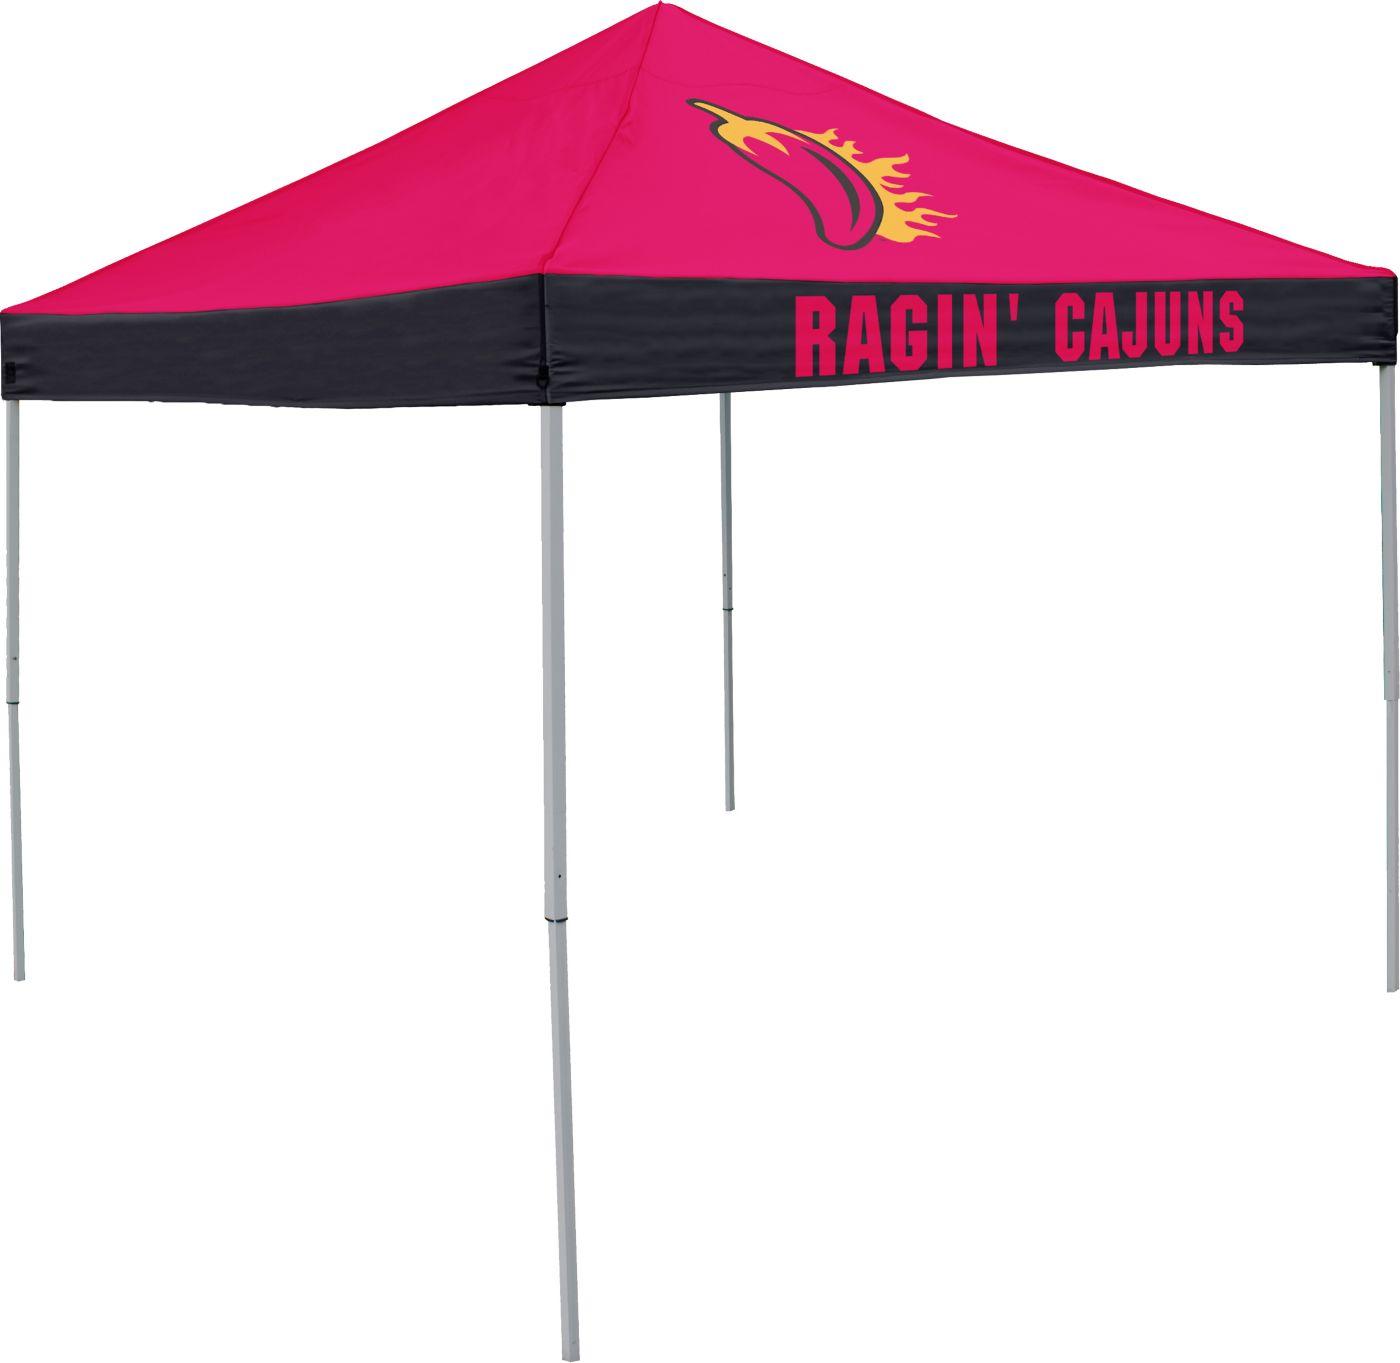 Louisiana Lafayette Ragin' Cajuns Economy Tent